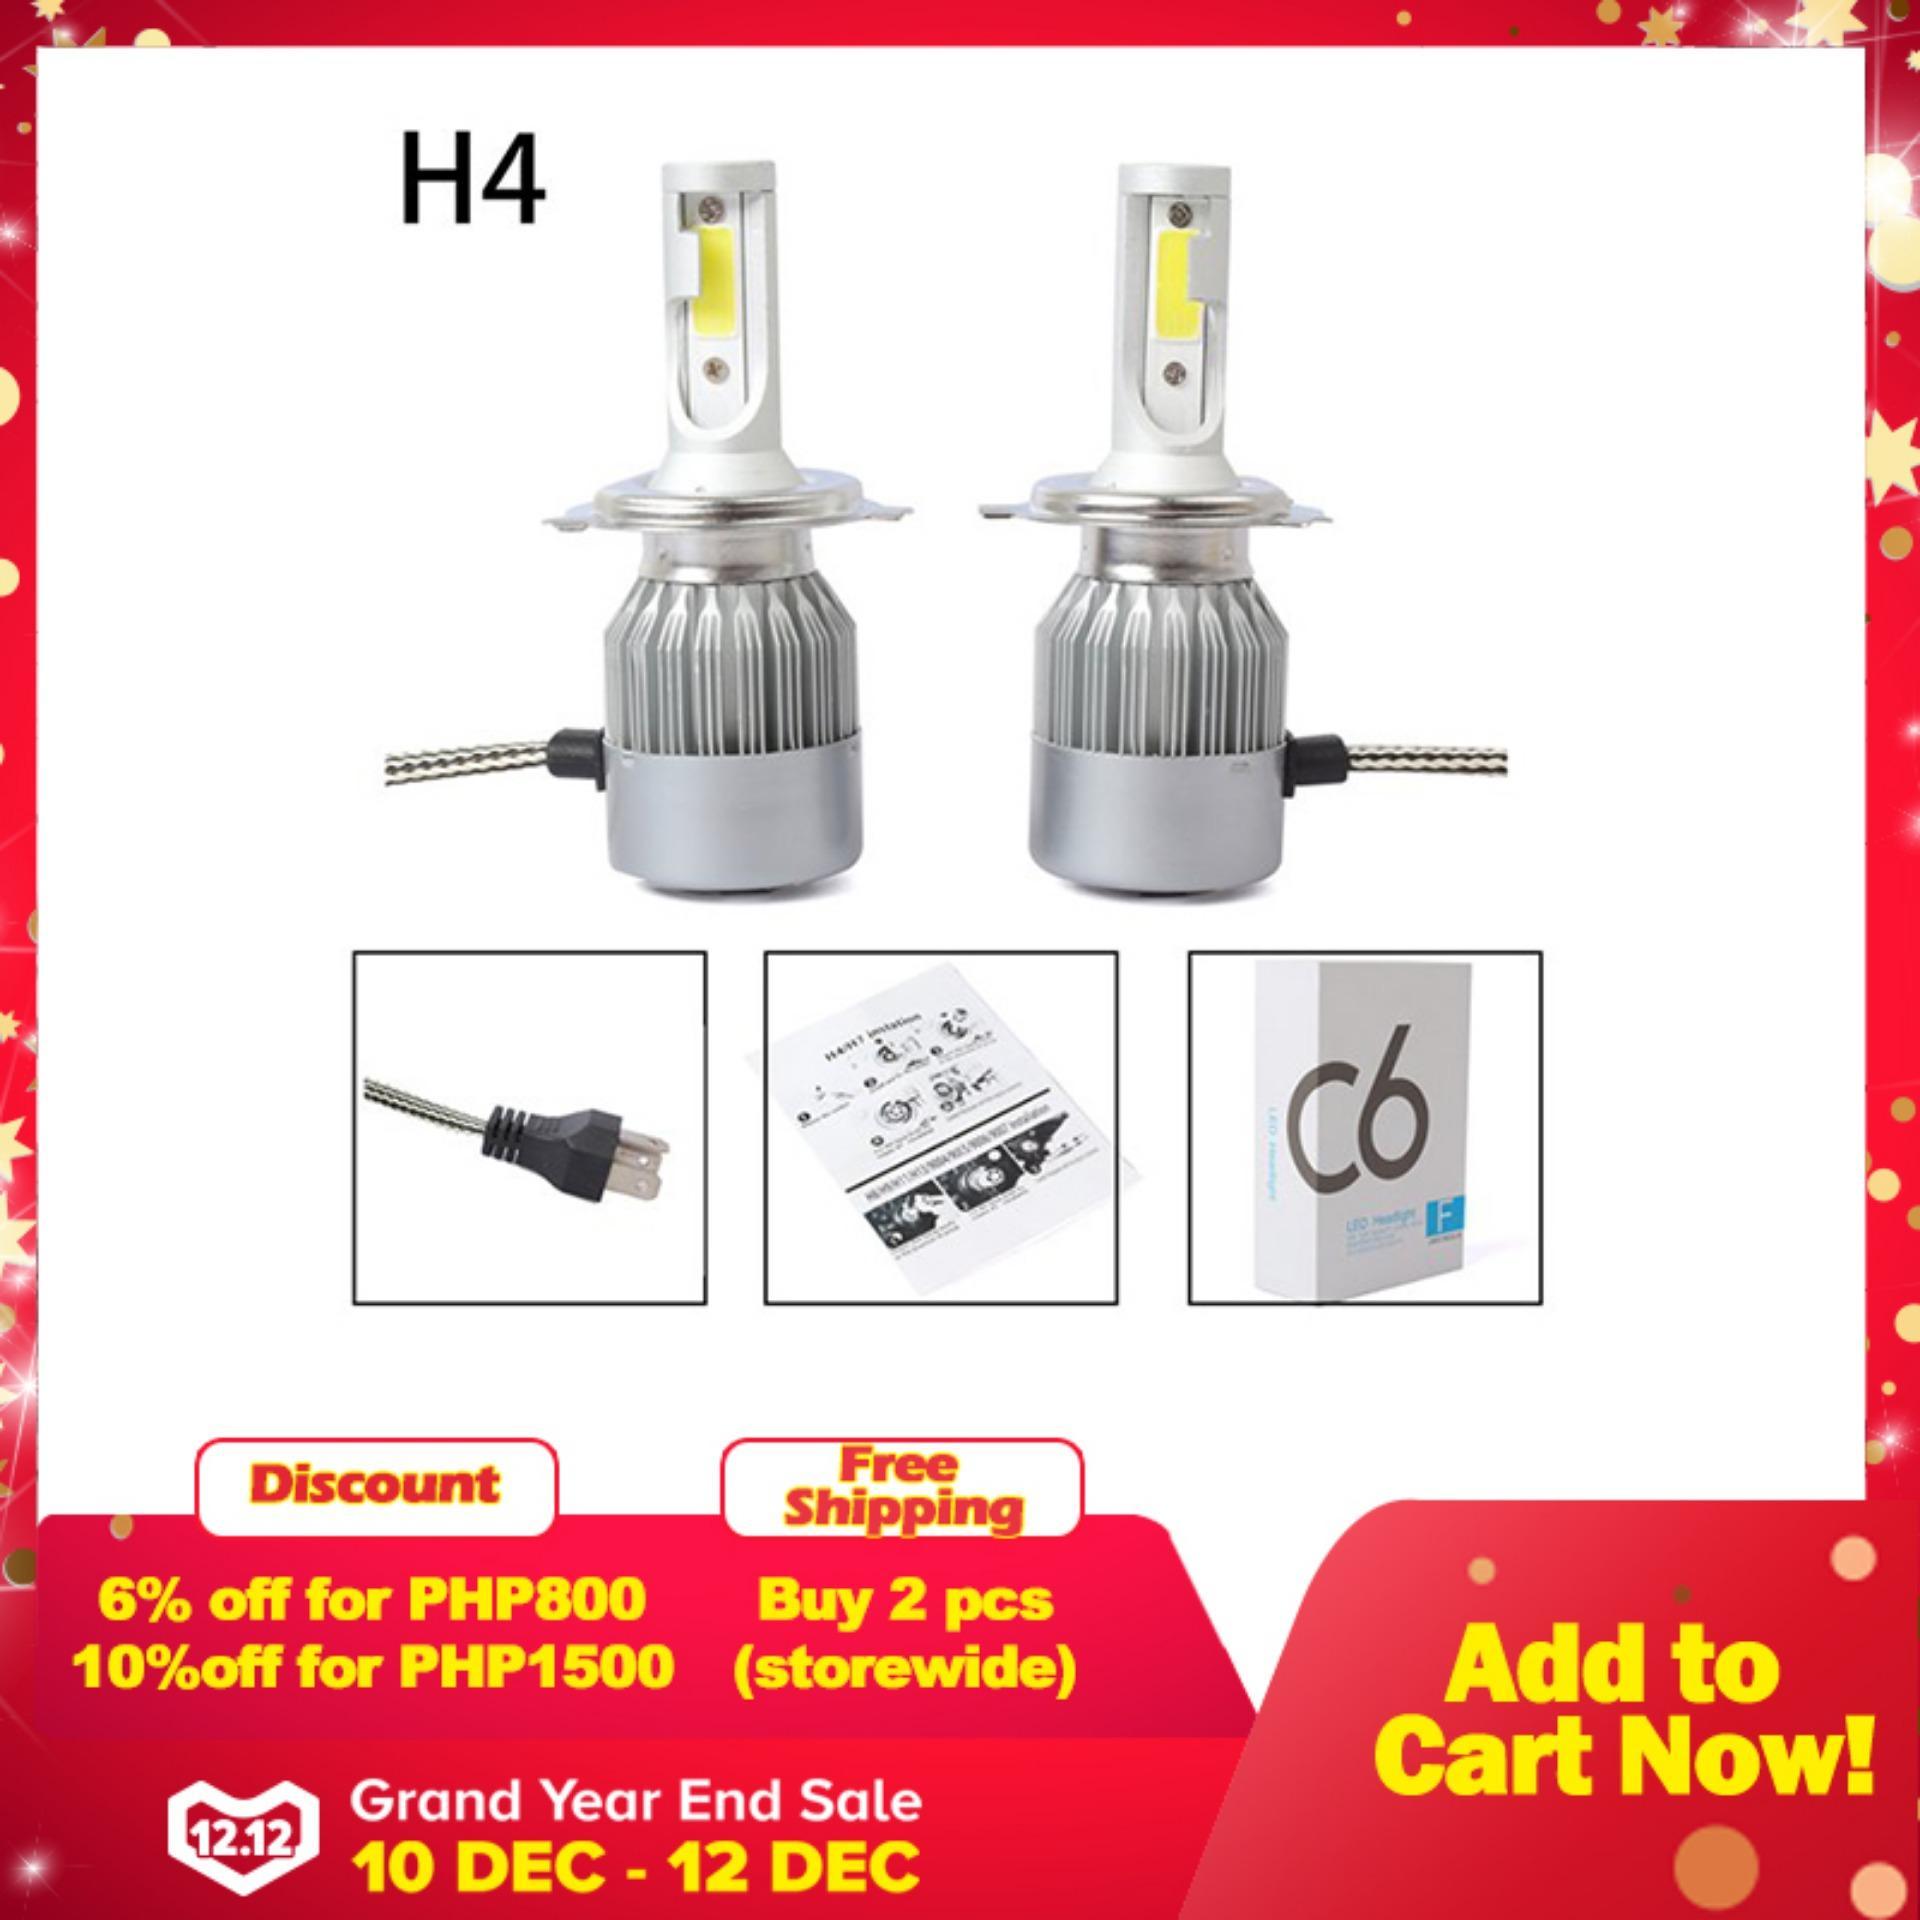 hight resolution of new 2pcs c6 led car headlight kit cob h4 36w 7600lm white light bulbs